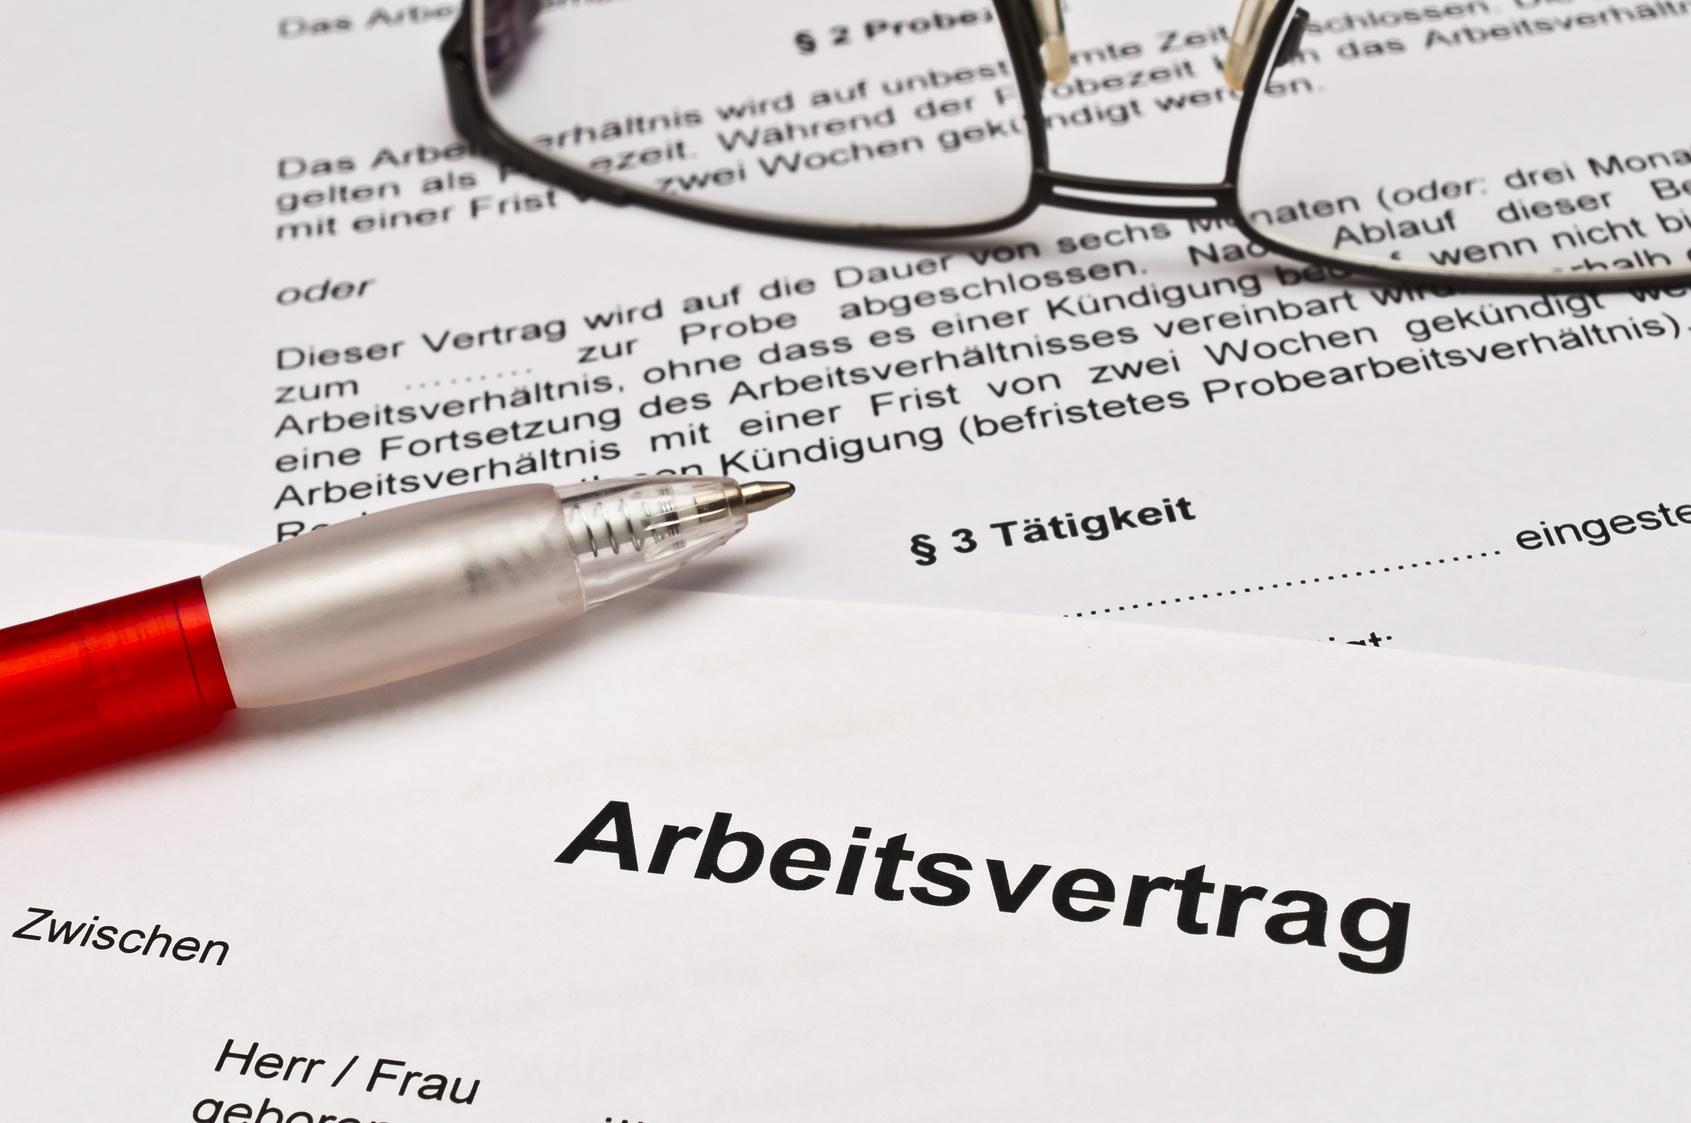 Bewerbungstipps Zahnarzt - Arbeitsvertrag Zahnarzt Konkurrenzklausel